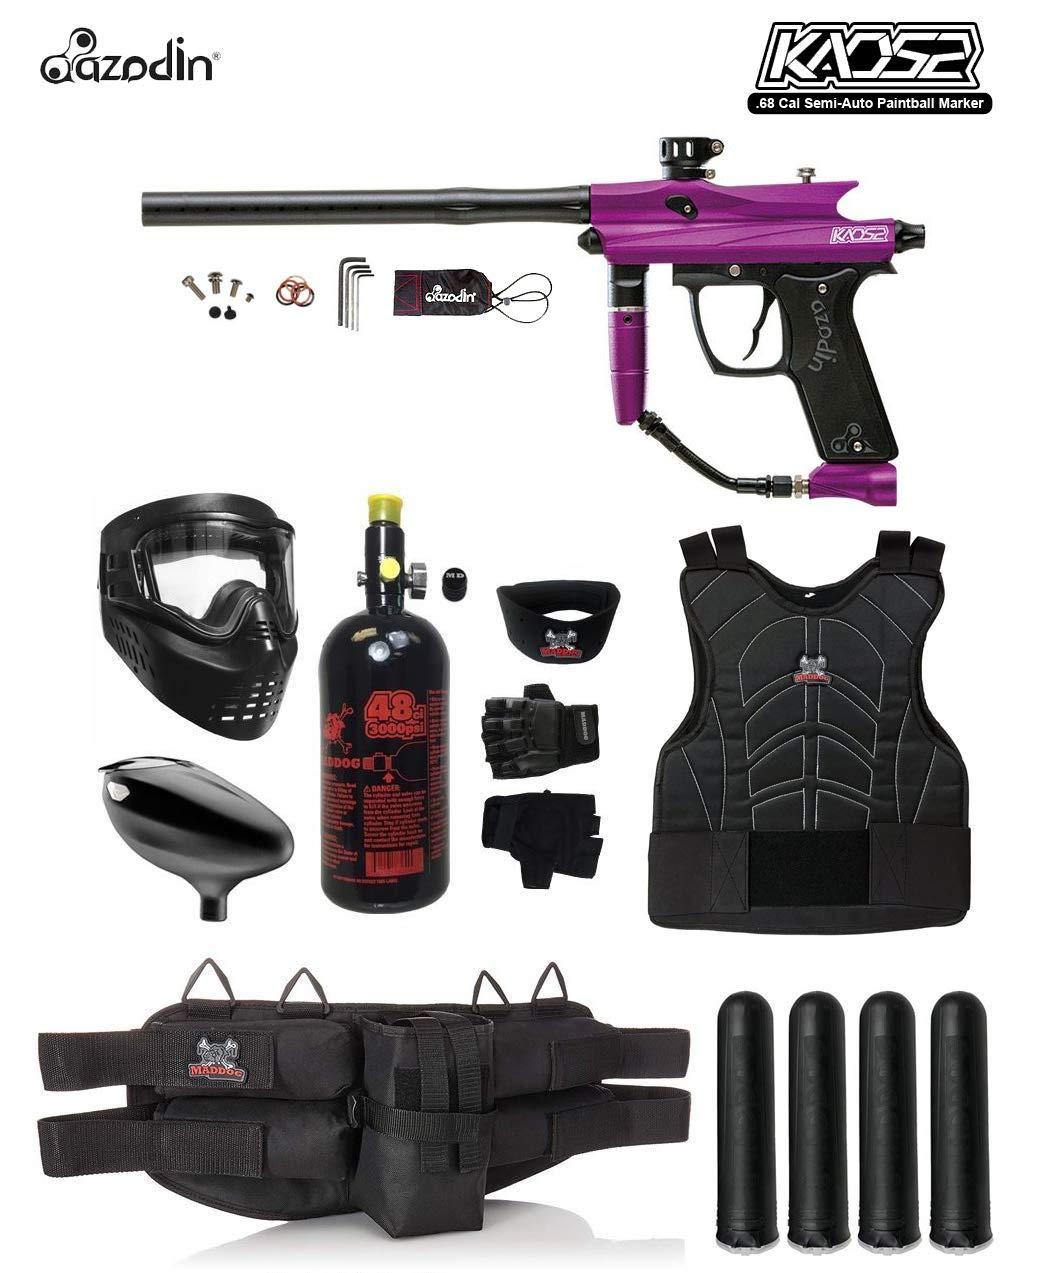 MAddog Azodin KAOS 2 Starter Protective HPA Paintball Gun Package - Purple/Black